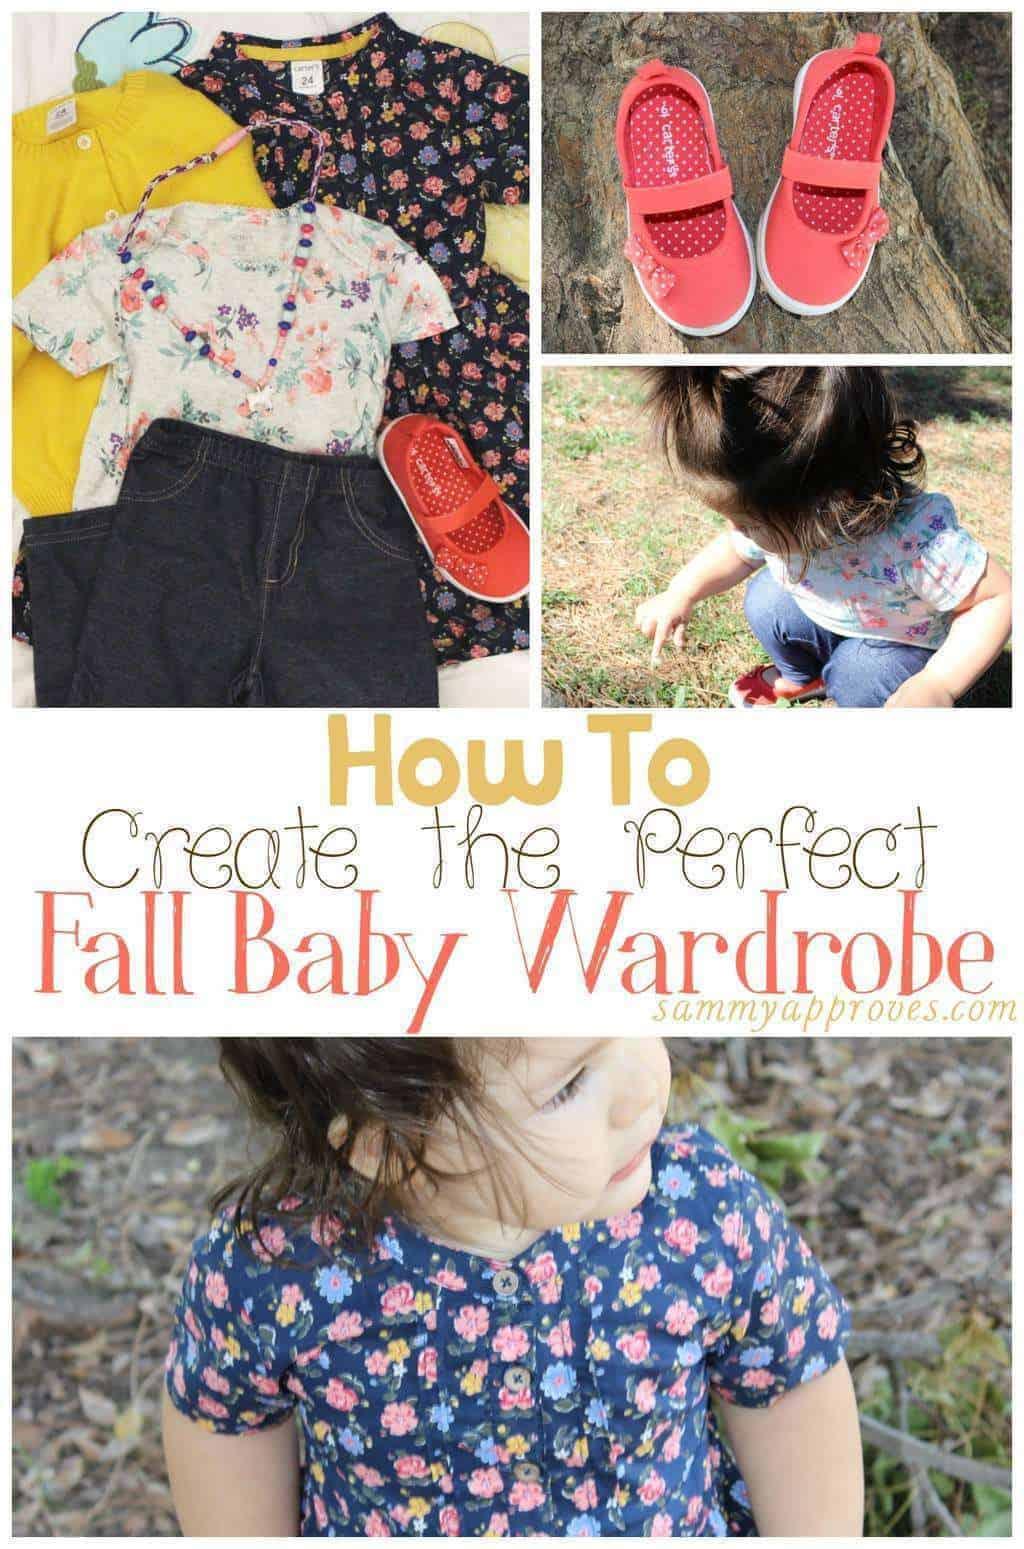 create-the-perfect-fall-baby-wardrobe